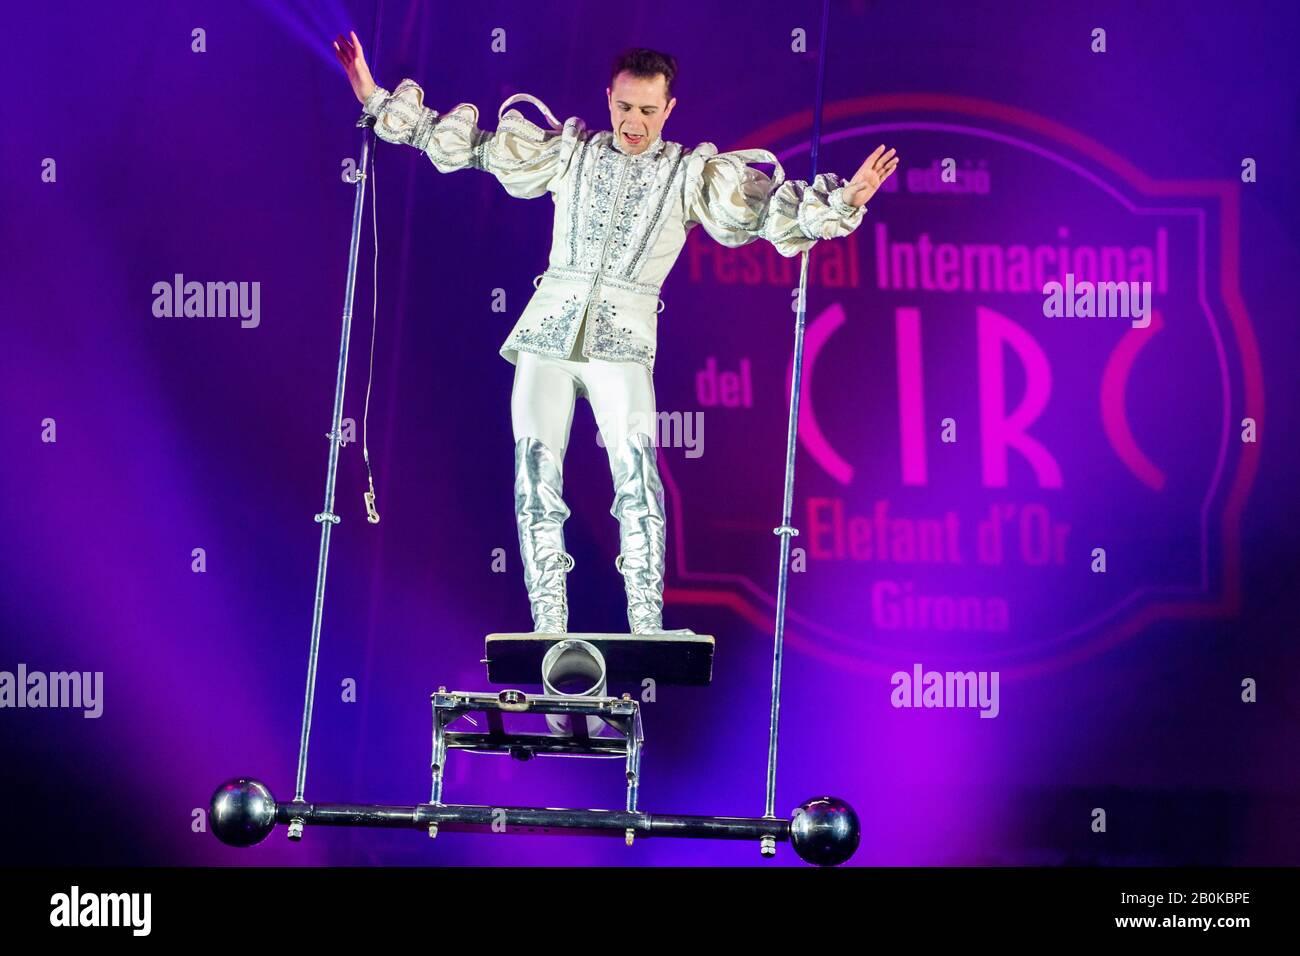 GIRONA, SPAIN - FEBRUARY 17: Belarus Vladimir Ivanov performs balancing during 'Elefant d'Or' International Circus Festival at Parc de la Devesa on Fe Stock Photo